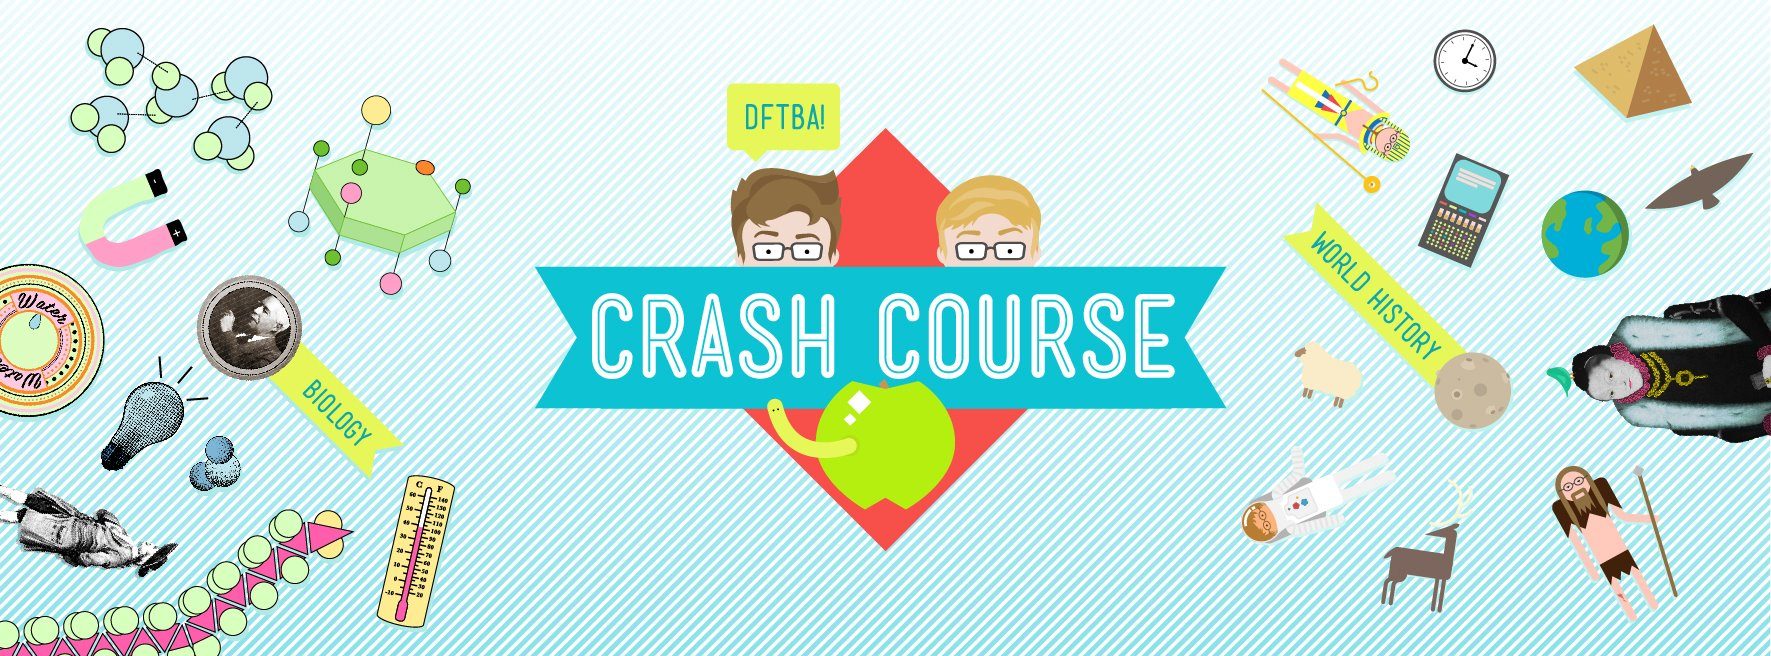 Crash course on literature